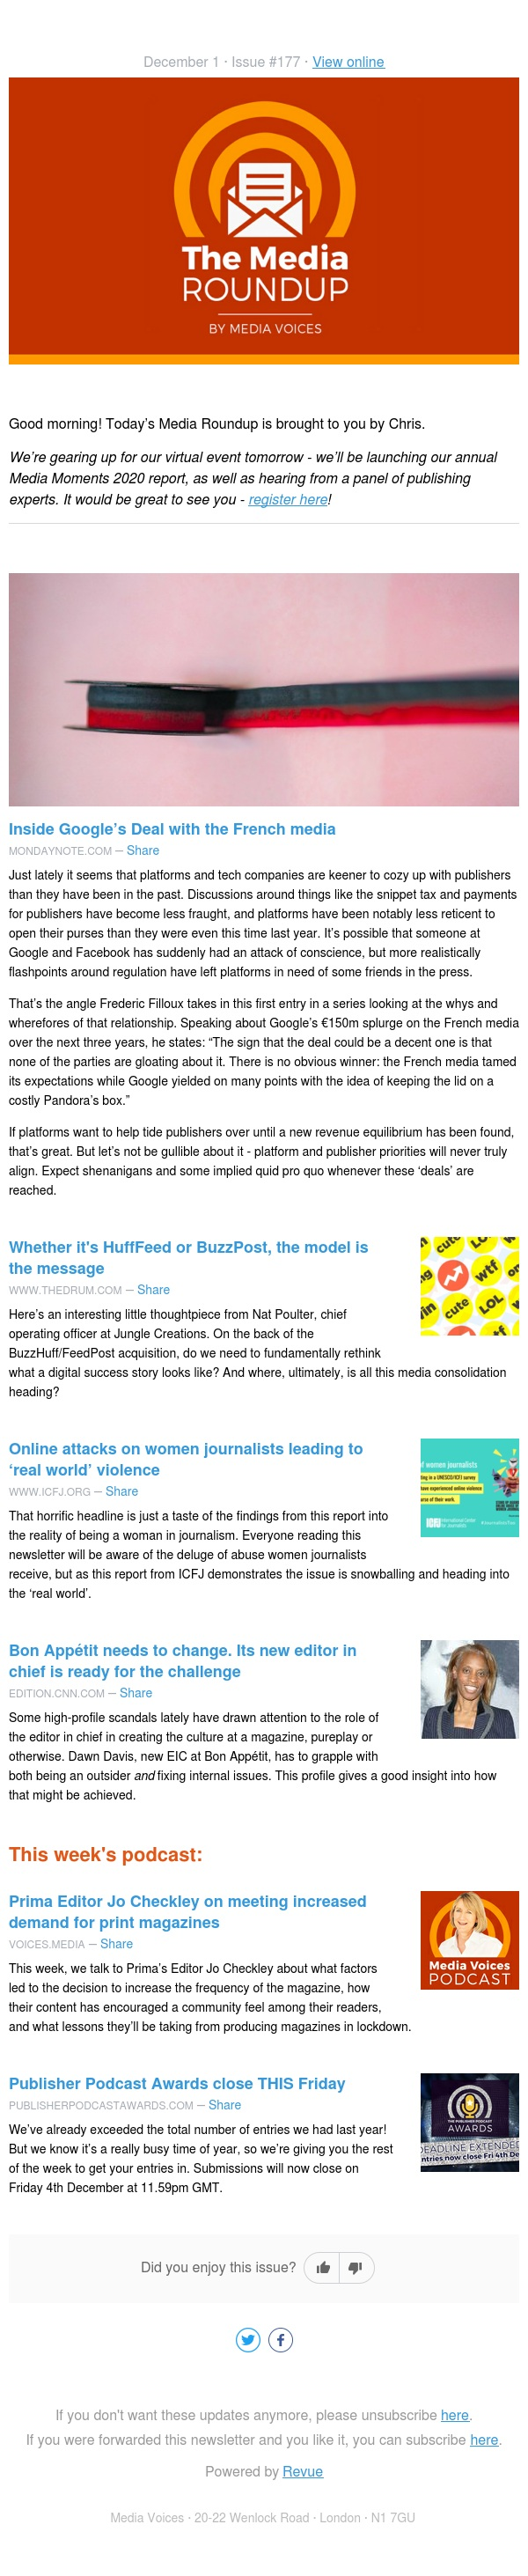 Tuesday 1st December: The secret shenanigans behind platforms paying publishers